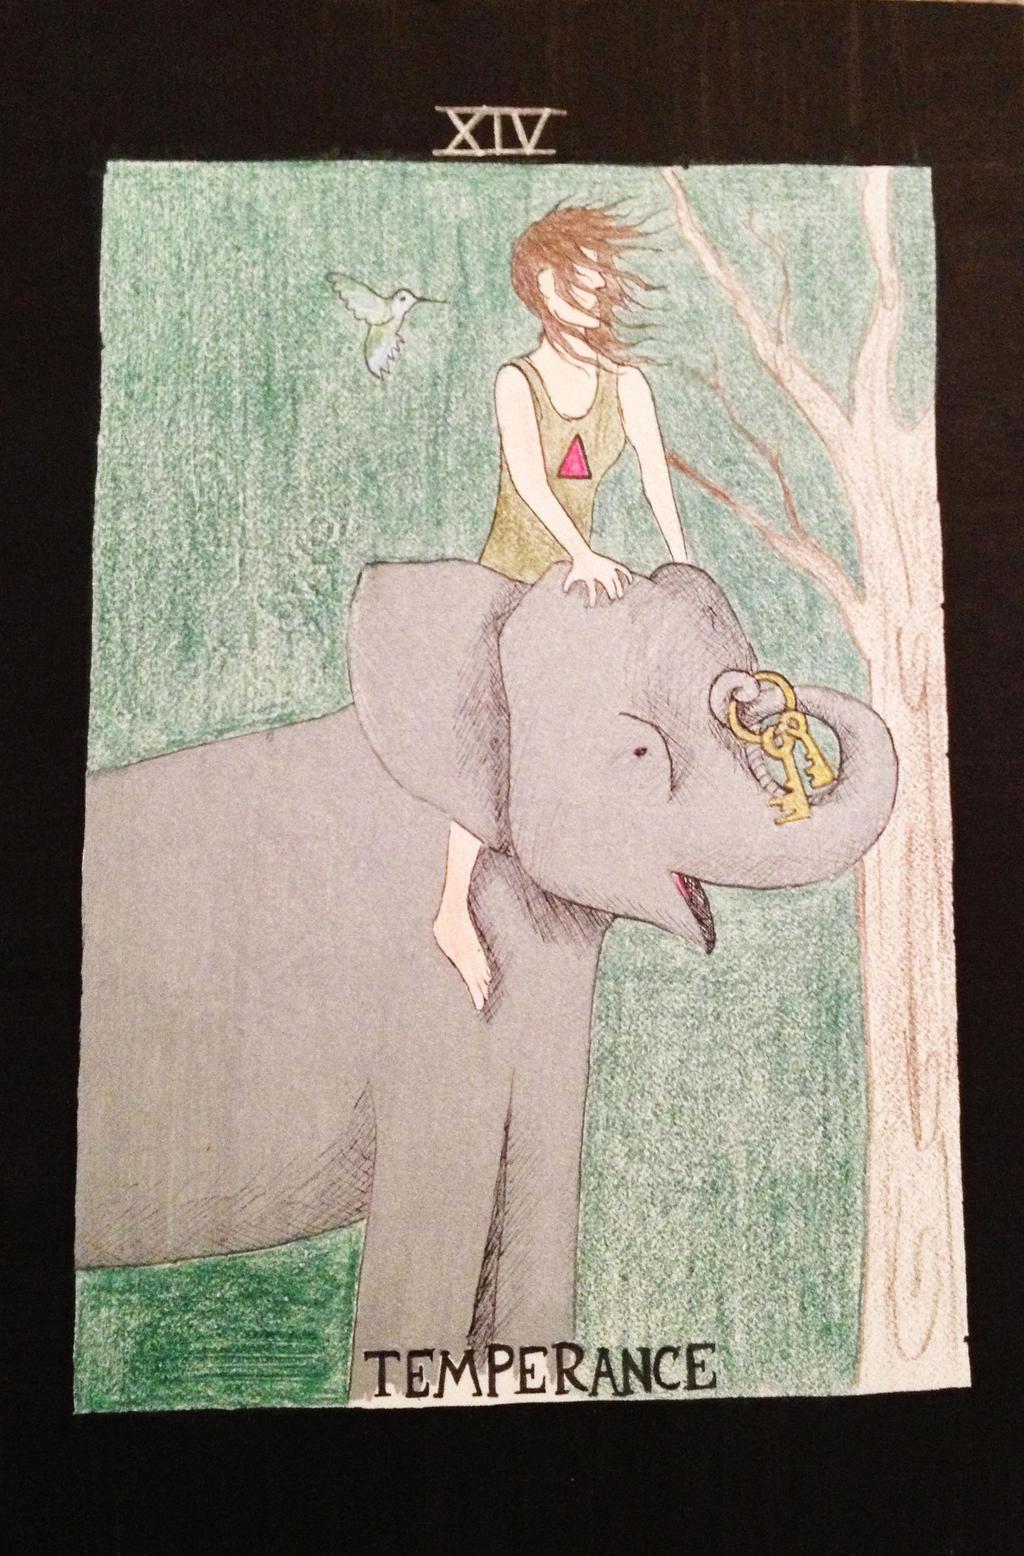 Temperance-Tarot Card by ArtByJulia on DeviantArt